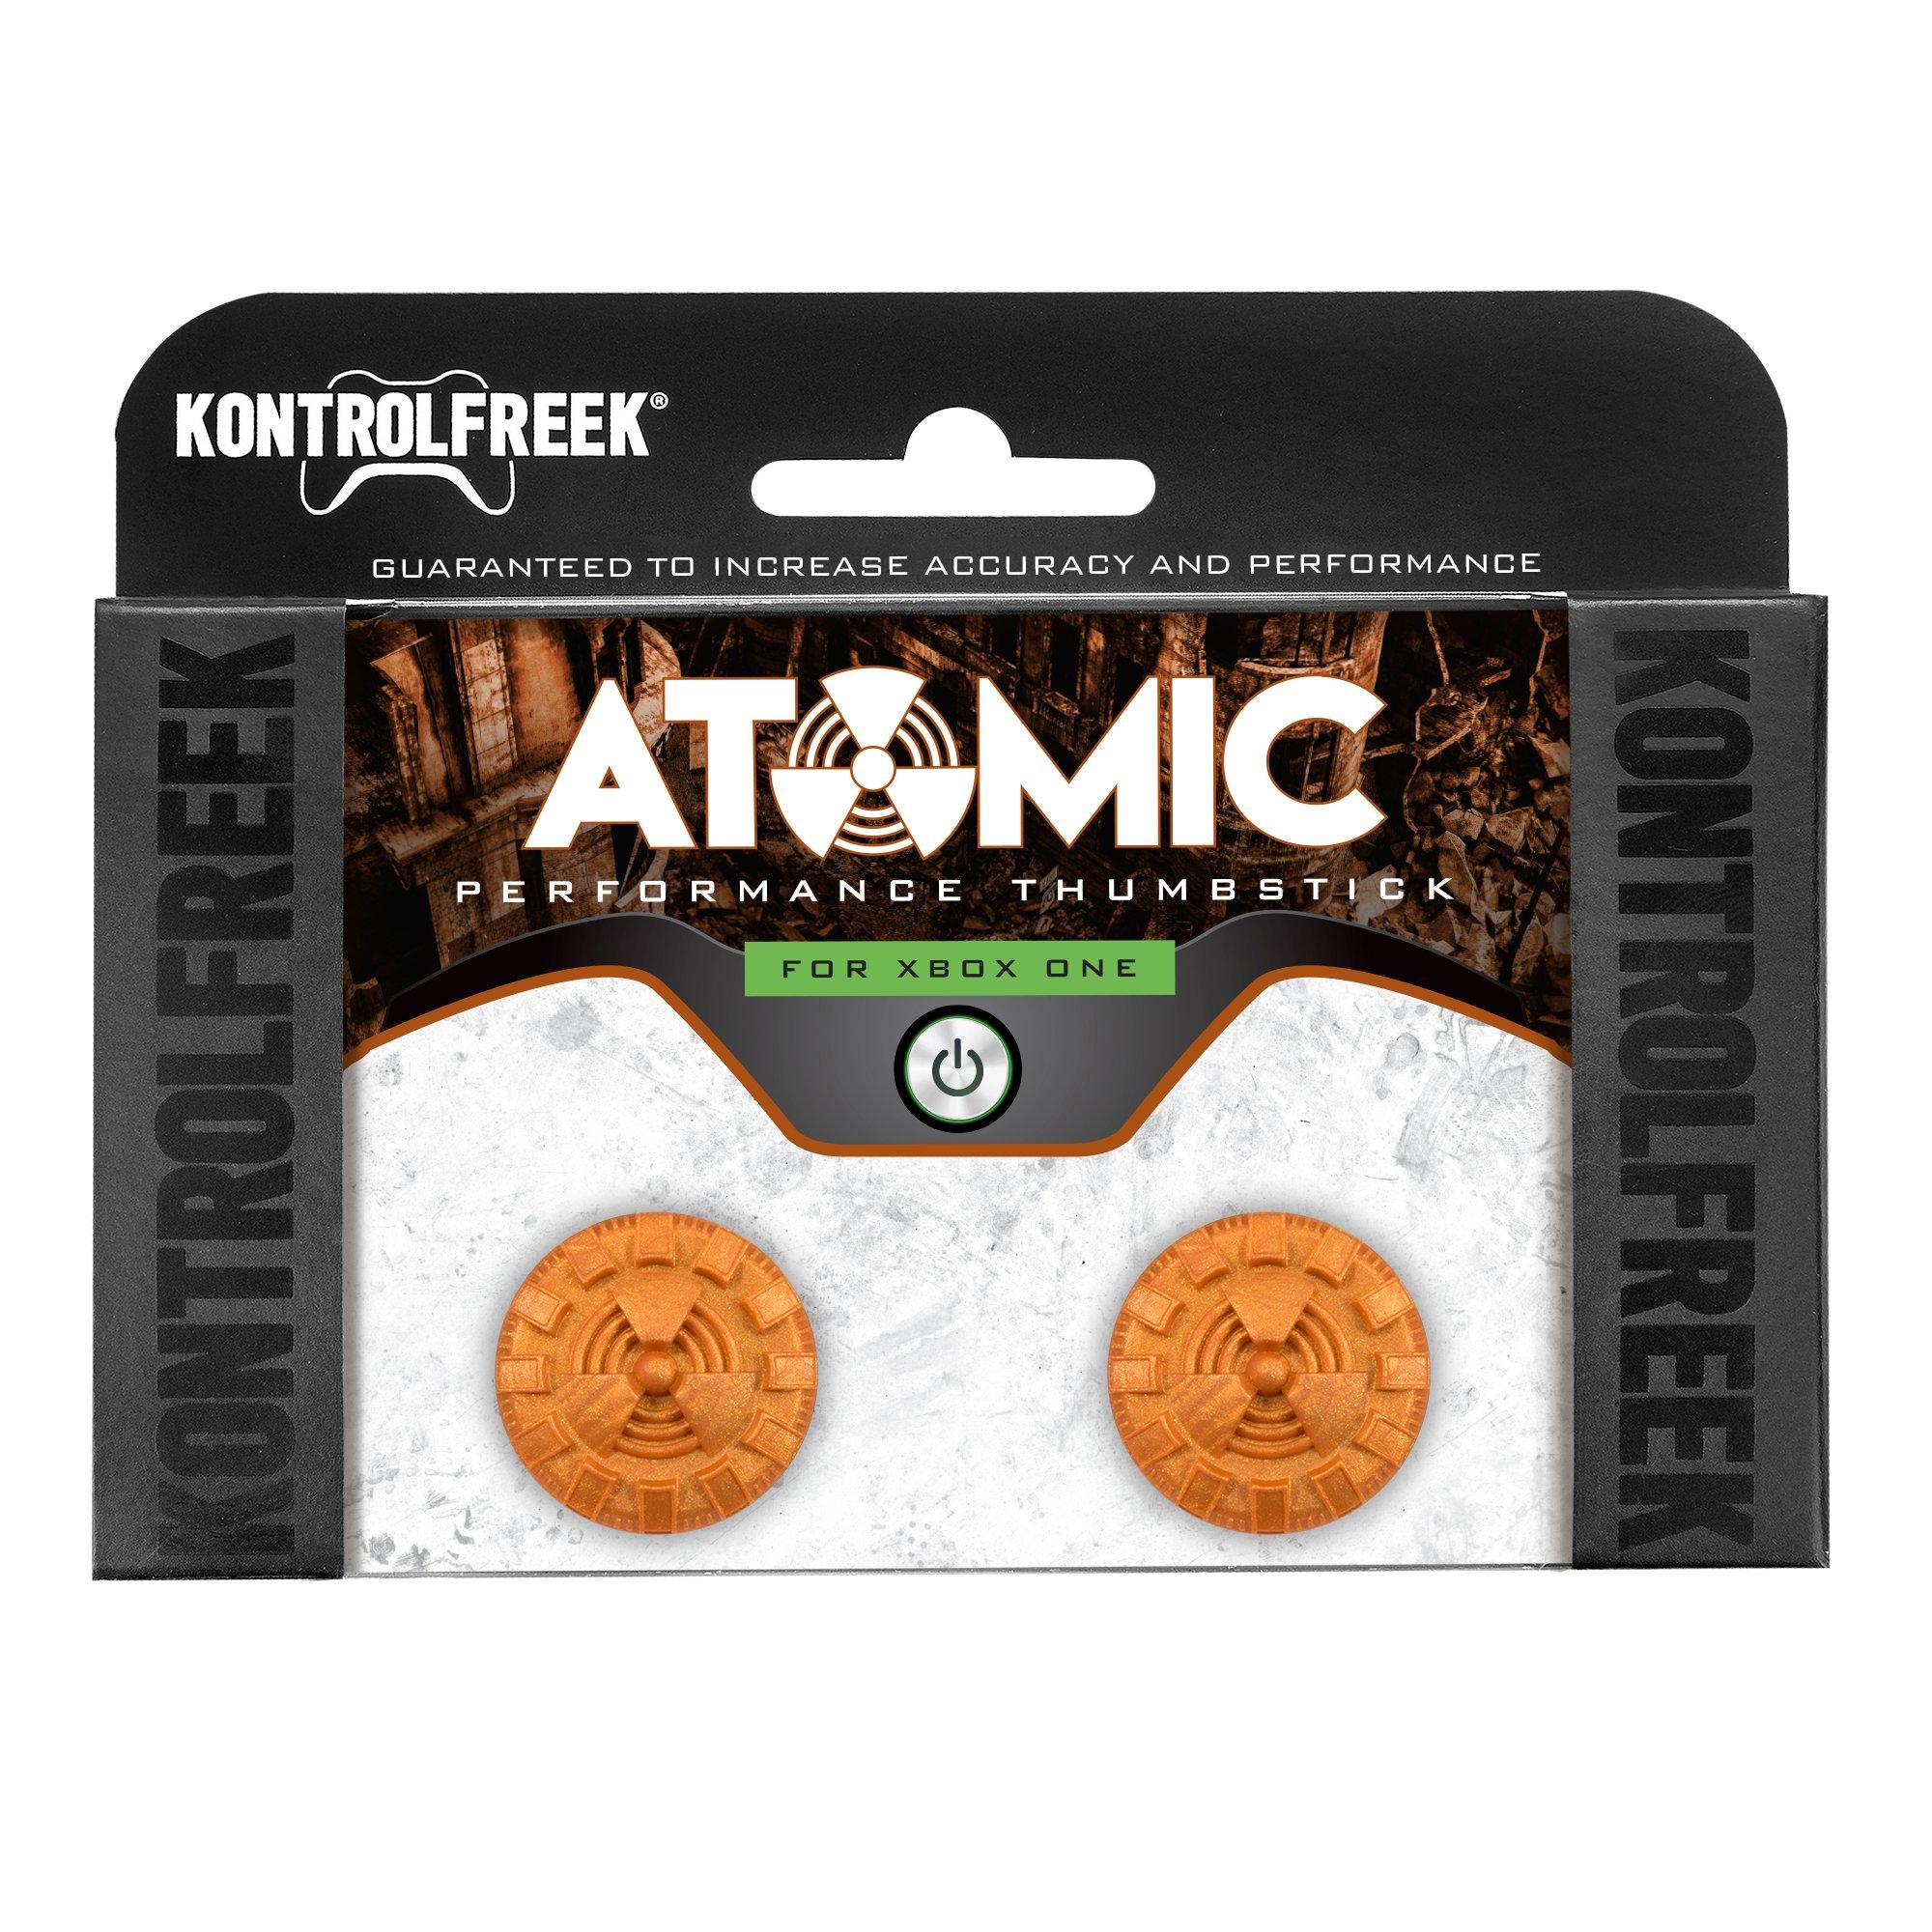 KontrolFreek Atomic for Xbox One Controller   Performance Thumbsticks   2 Mid-Rise Convex   Orange by Kontrolfreek